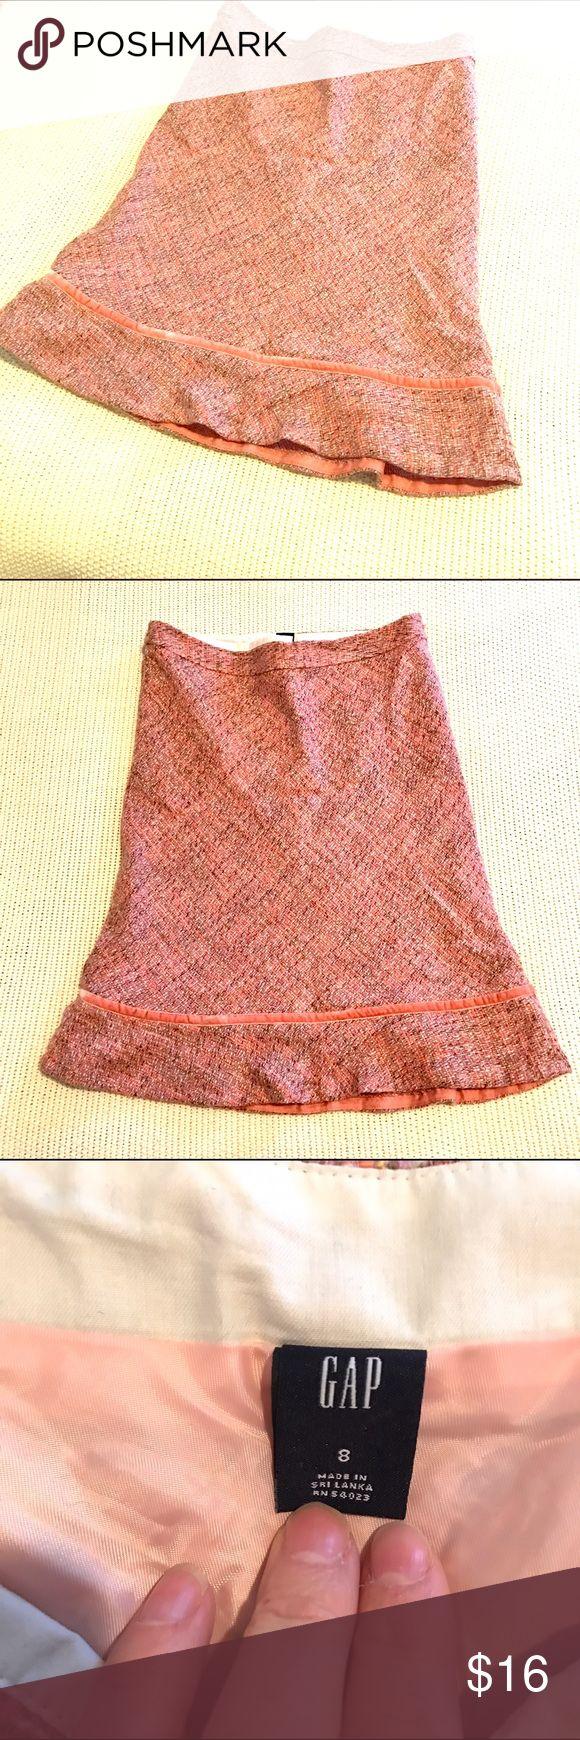 Pink Gap Skirt Pink Gap Skirt. Size 8, runs a little small. Knee length or a little longer. Shell: 38% wool, 62% acrylic. Lining 100% polyester. GAP Skirts